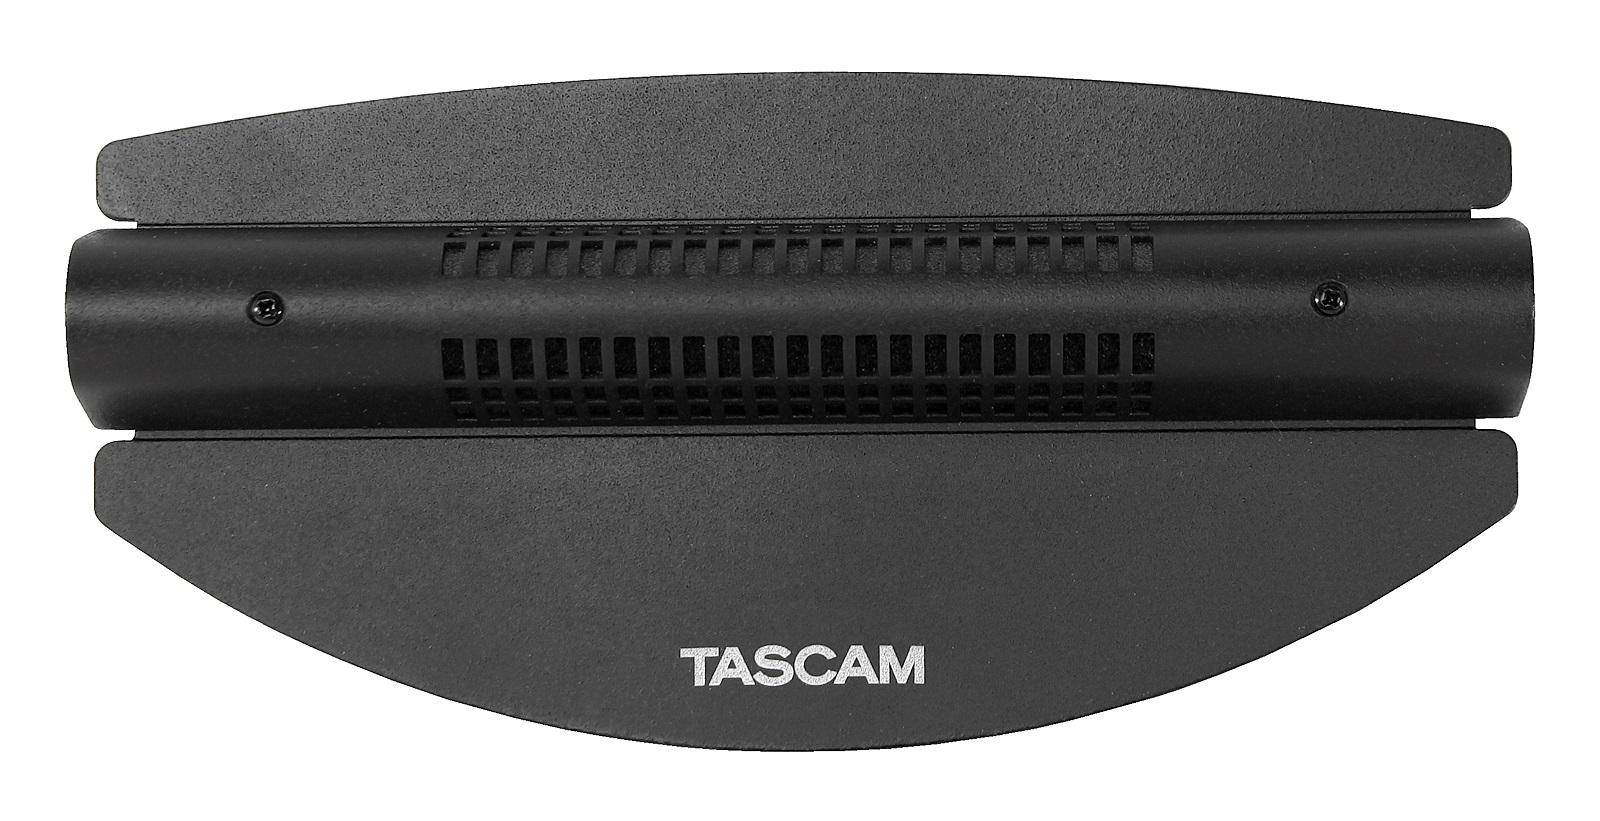 Tascam TM-90BM grænseflade-mikrofon